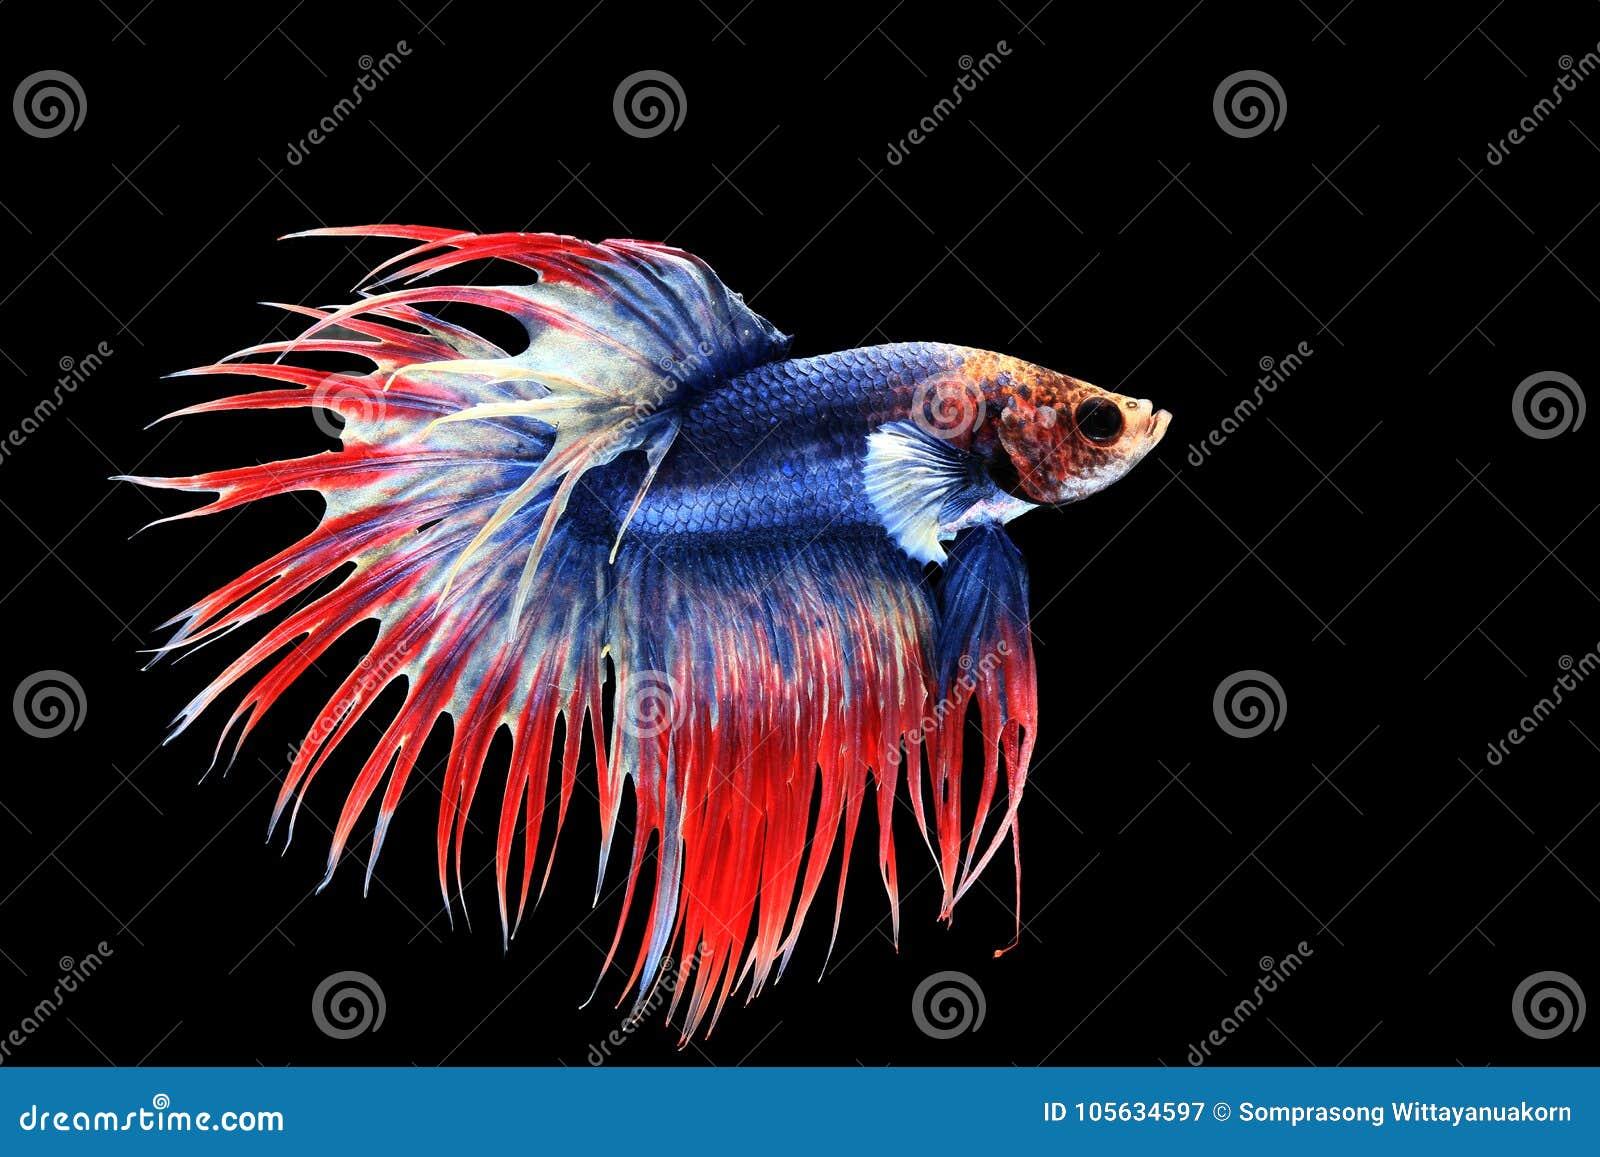 Betta splendens crown tail stock image. Image of fancy - 105634597